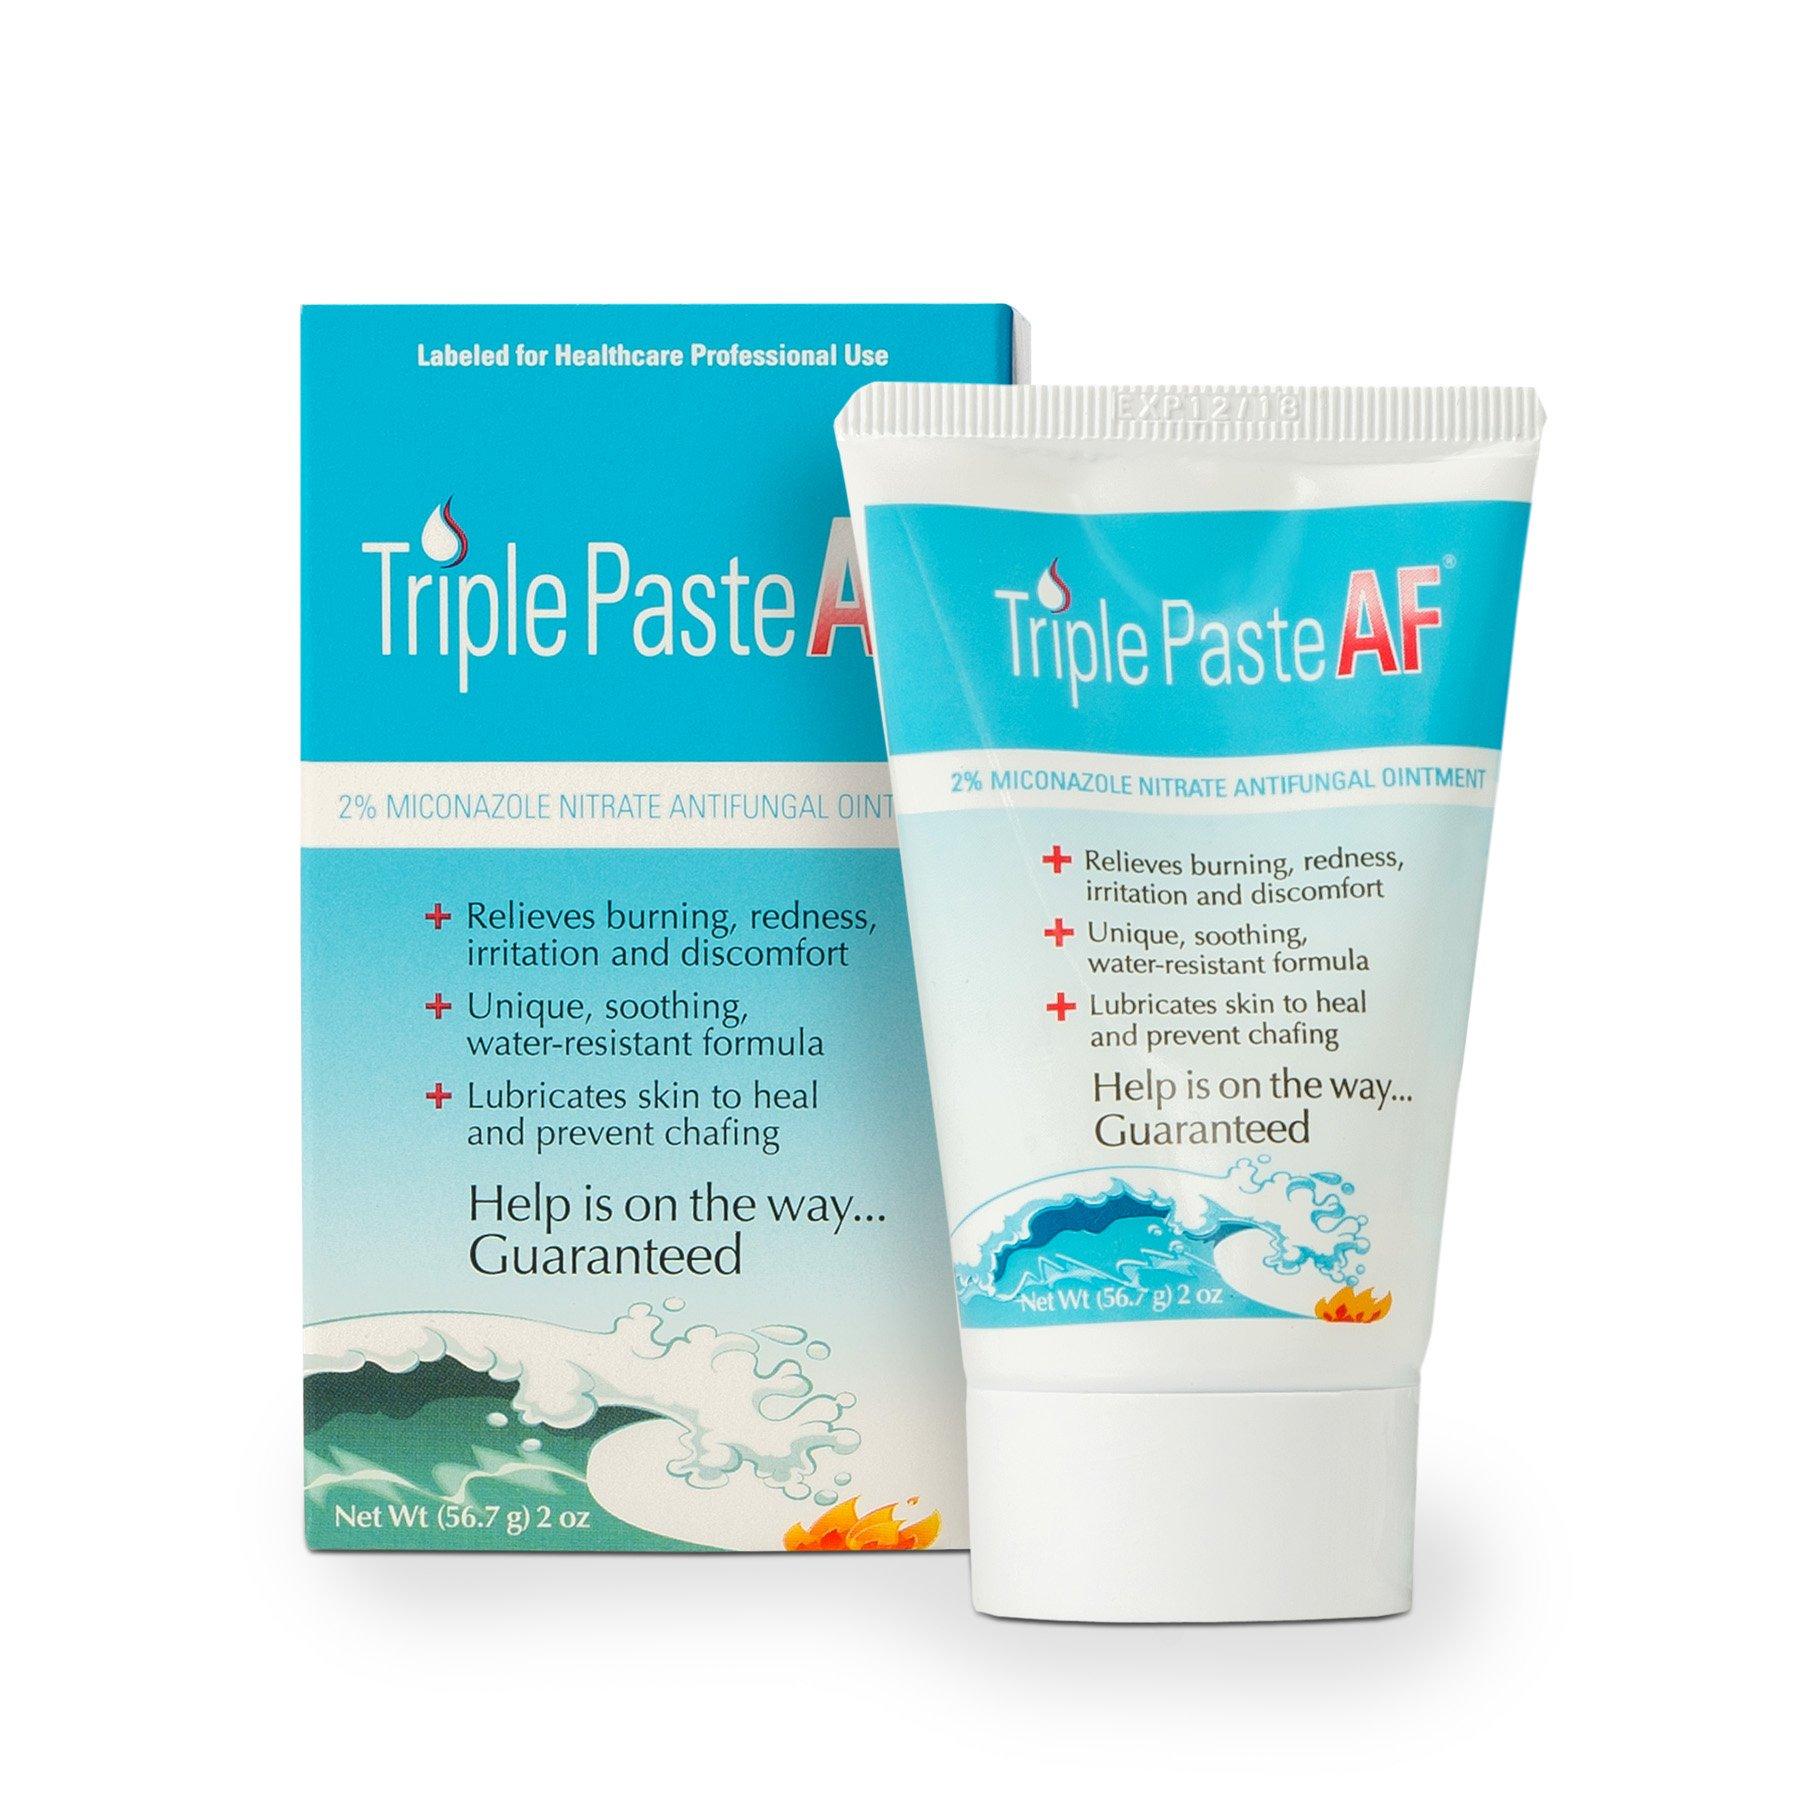 Triple Paste Antifungal Ointment, 2 Ounce by Triple Paste